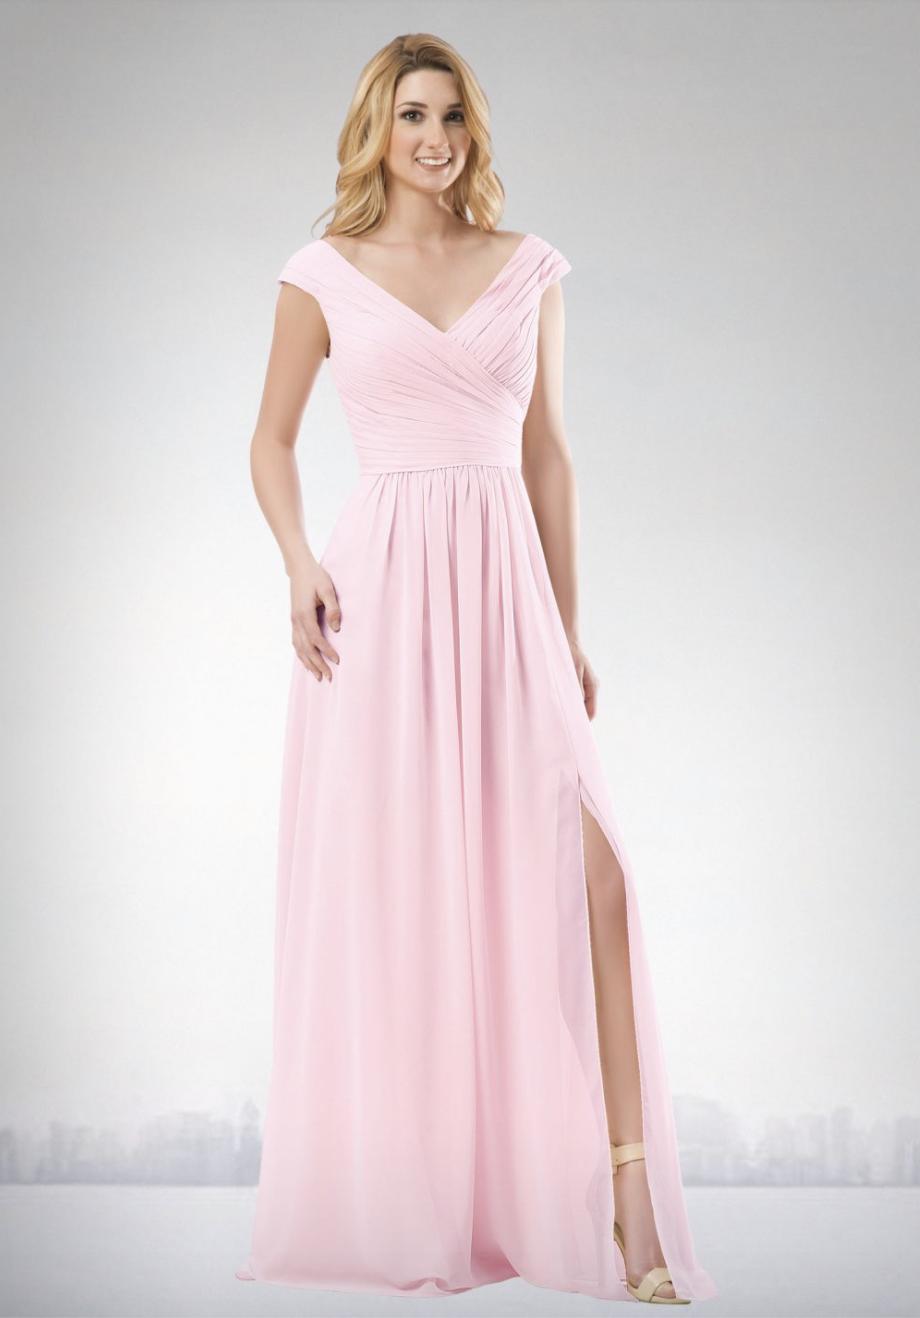 Kanali K Bridesmaids Dresses | Breathless Bridal